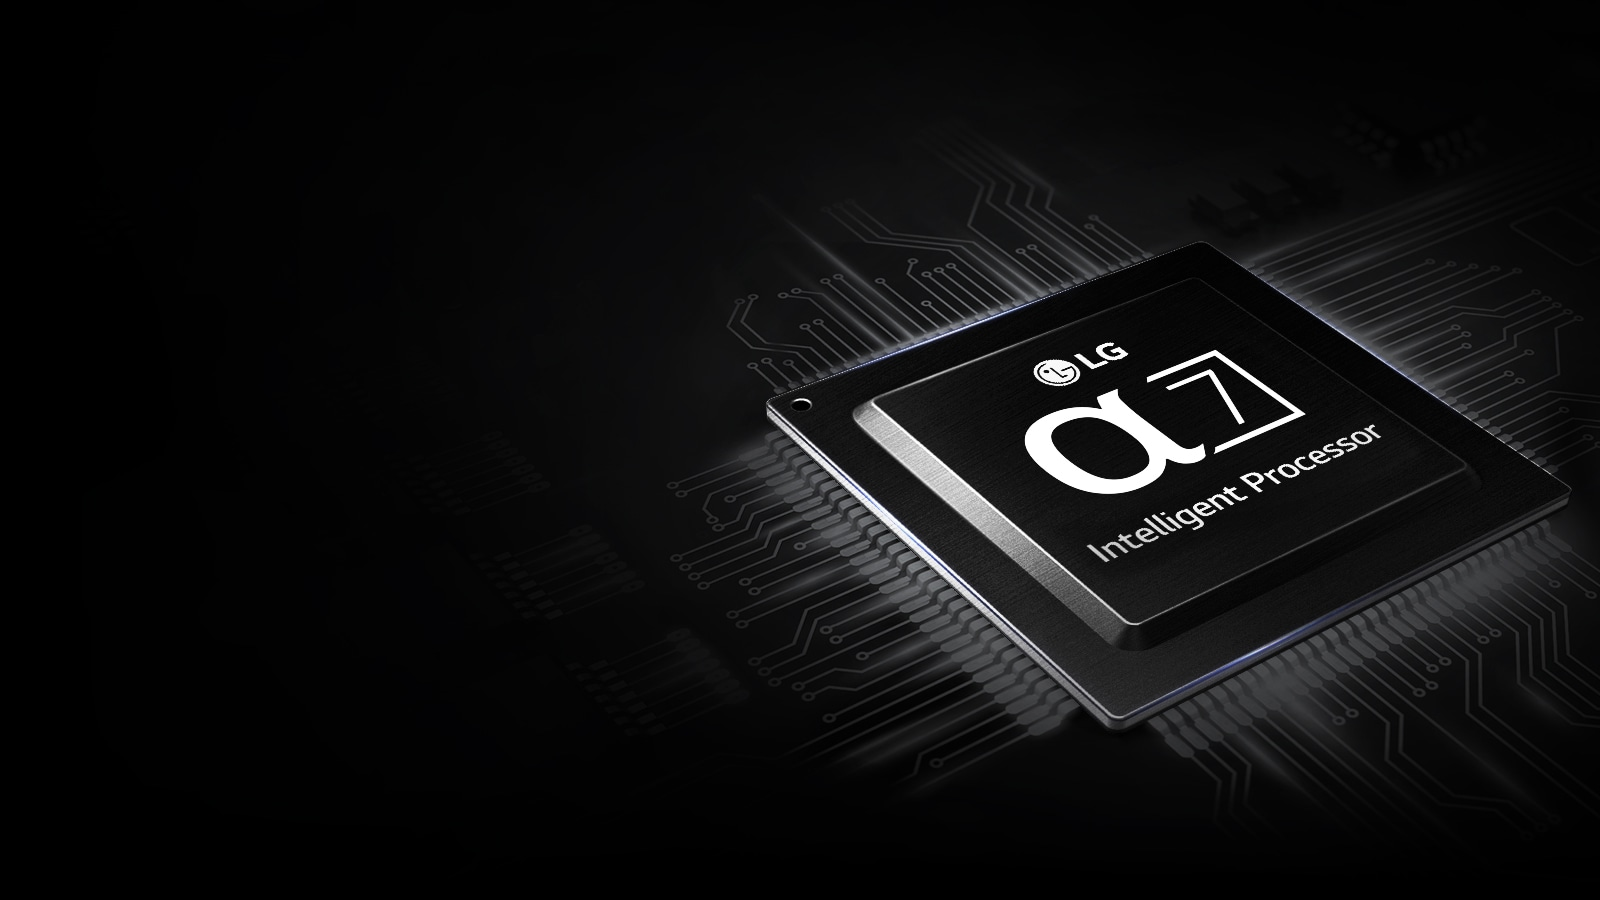 LG TV's - A Smart Brain α7 Intelligent Processor